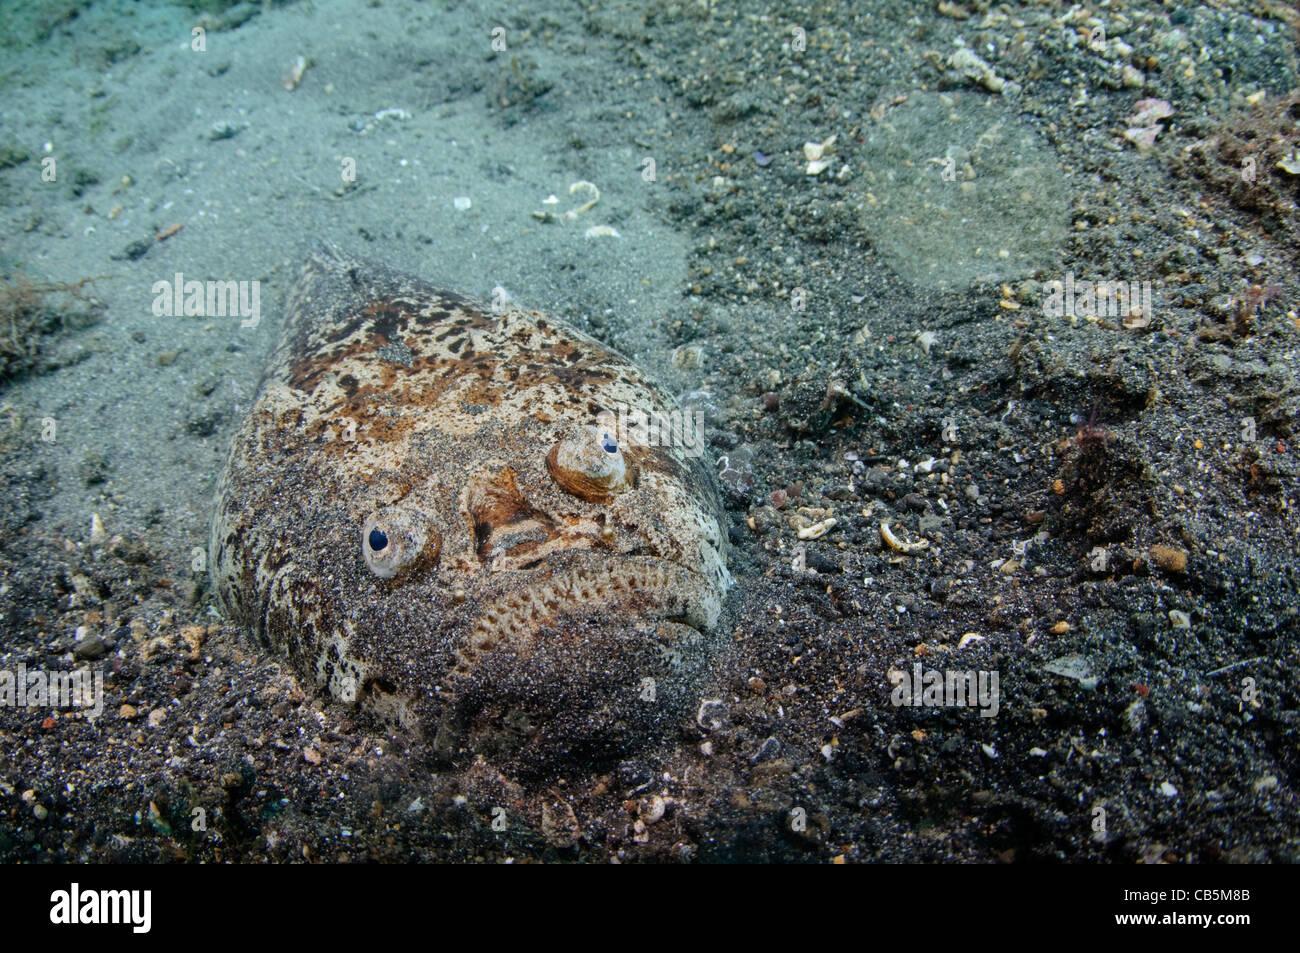 Stargazer portrait, Uranoscopus sp., Lembeh Strait, Bitung, Manado, North Sulawesi, Indonesia, Pacific Ocean - Stock Image